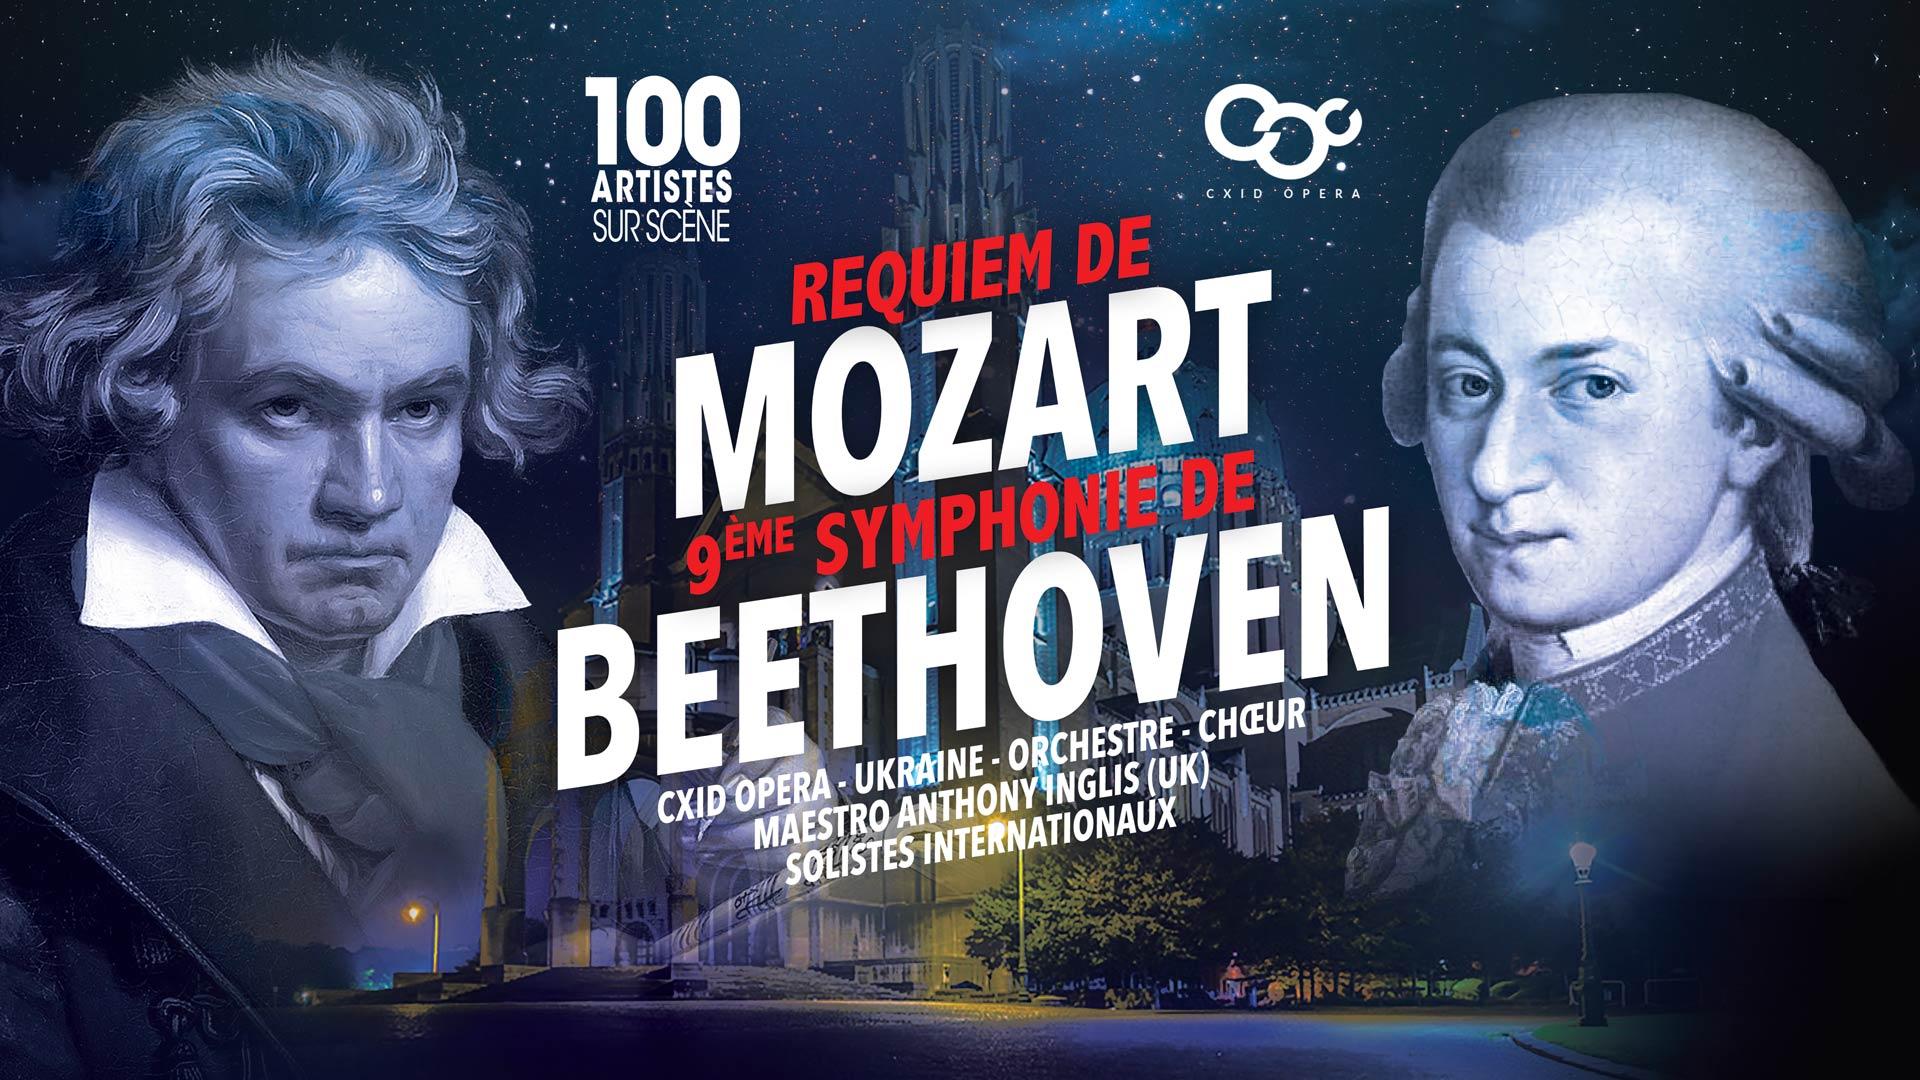 Le Requiem de Mozart et la 9ème symphonie de Beethoven, Basilique de Koekelberg